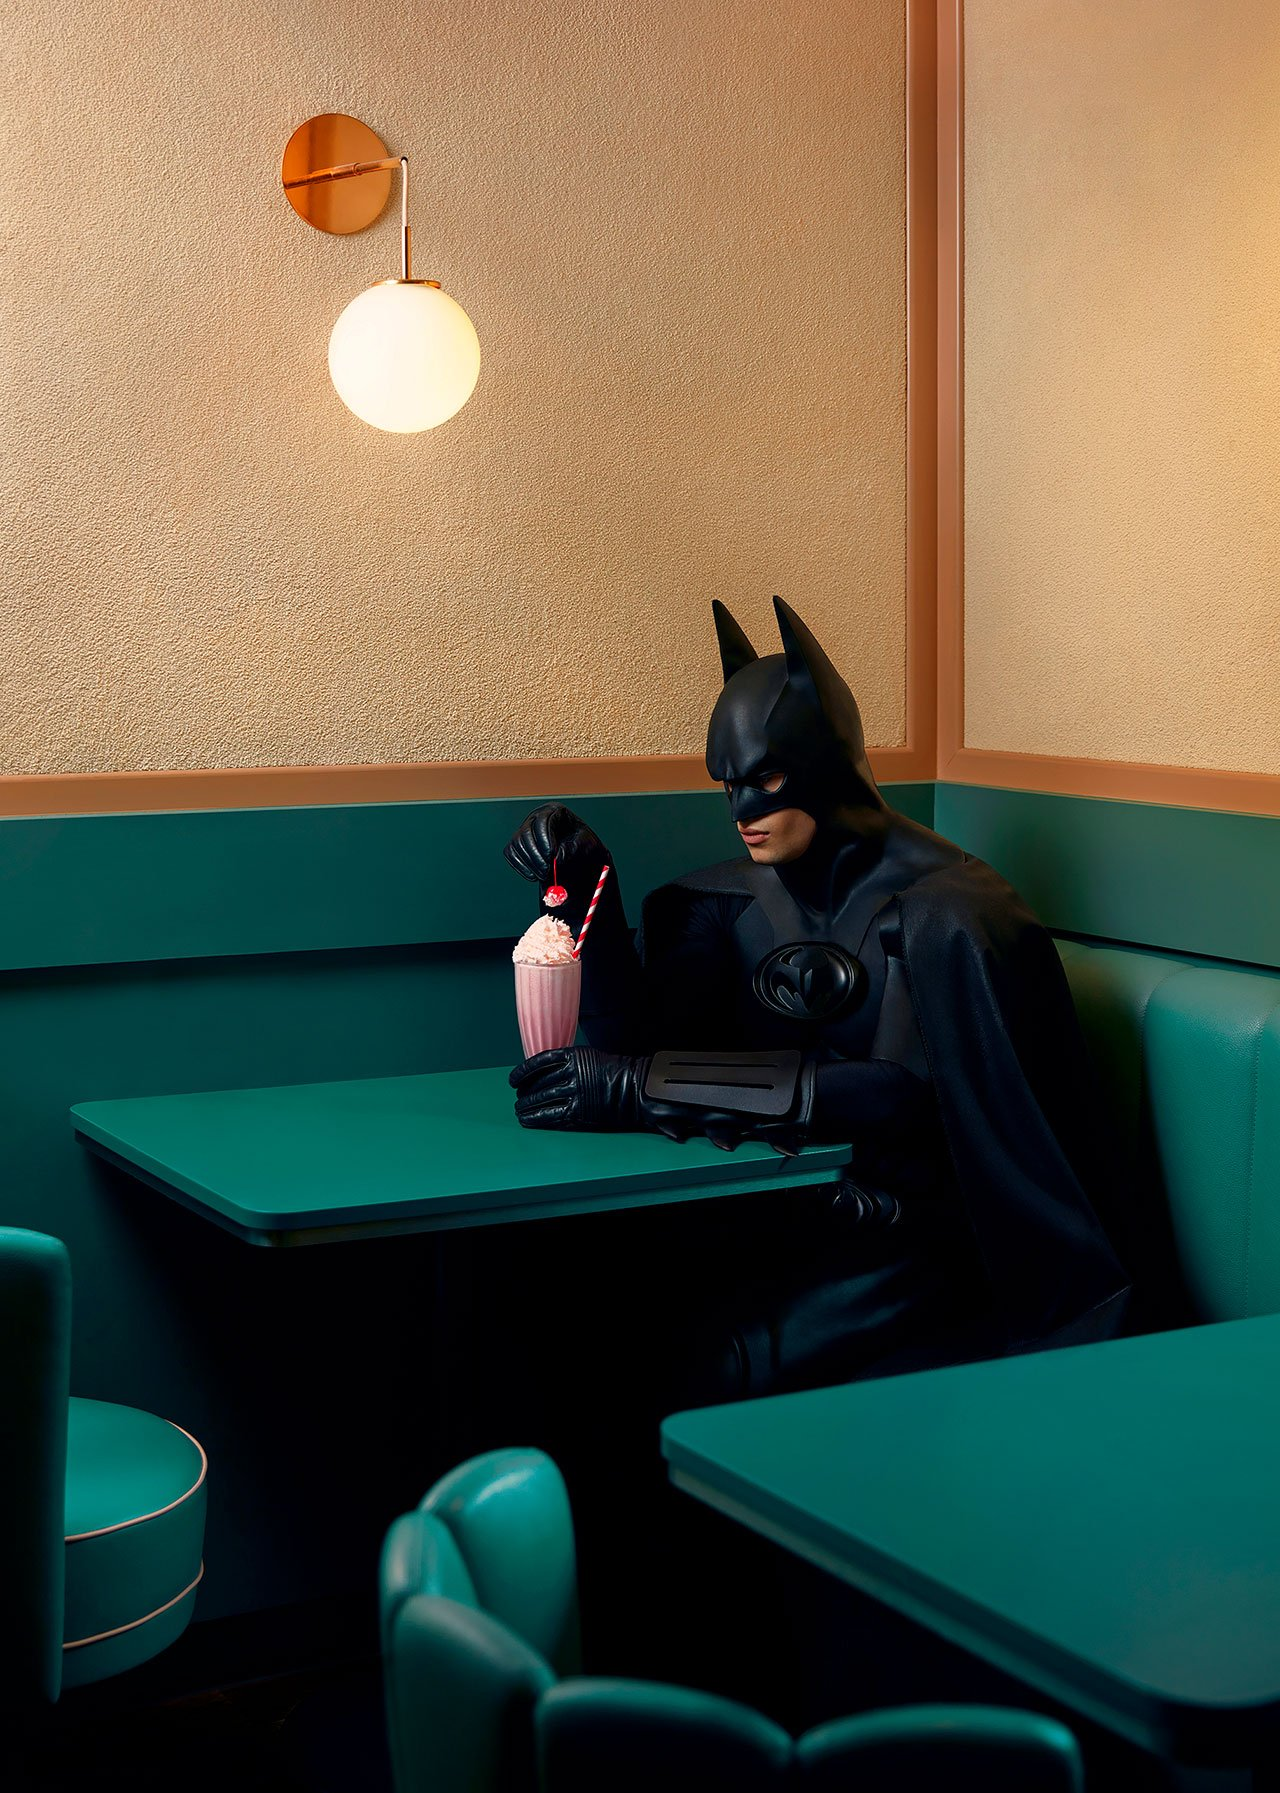 Daily Bat - Stood Up. Photography by Sebastian Magnani.